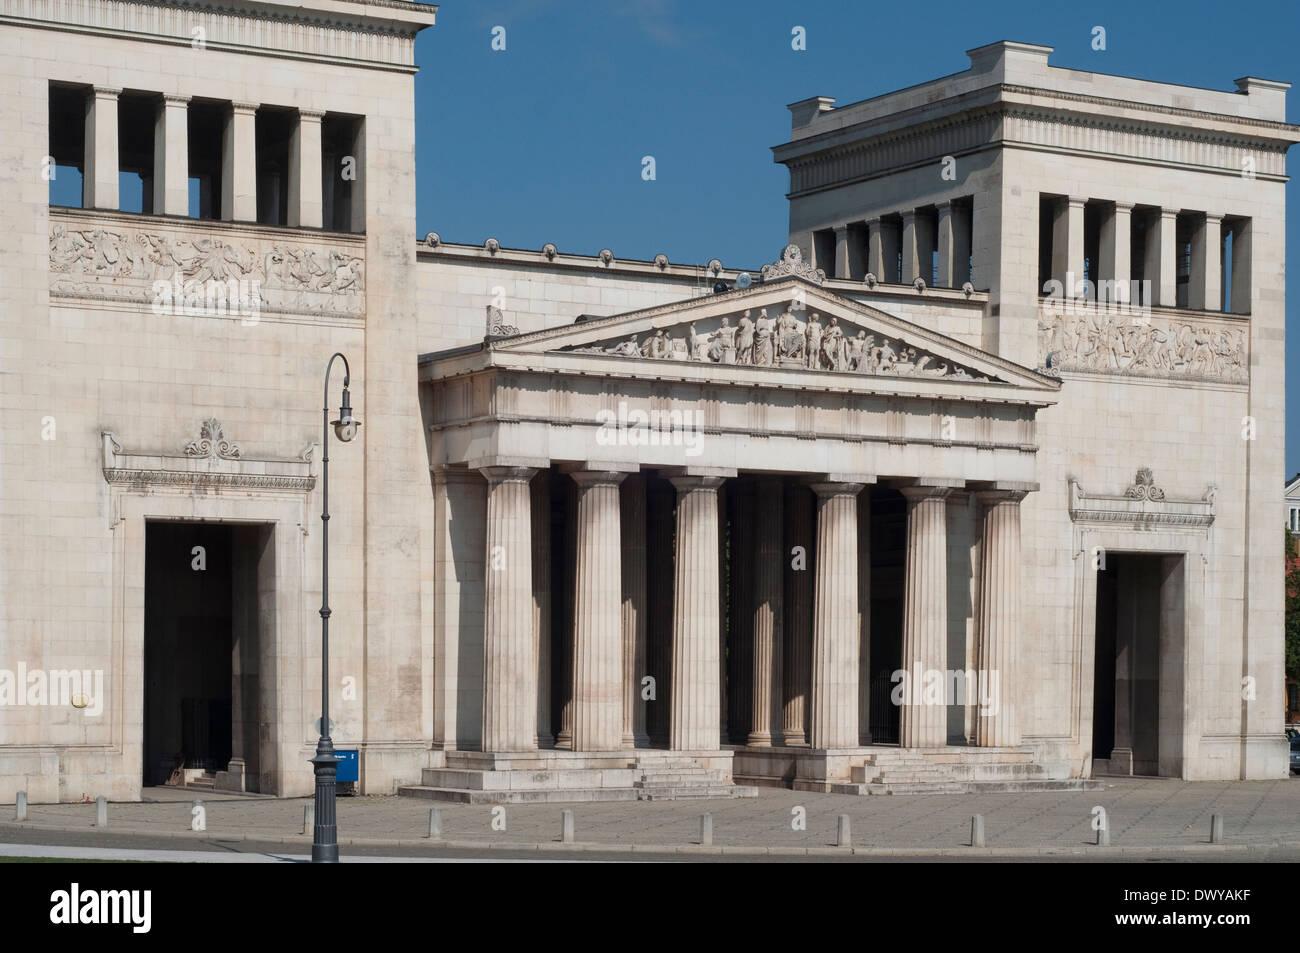 Germany, Bavaria, Munich, Koenigsplatz Square, Propylaea Building - Stock Image